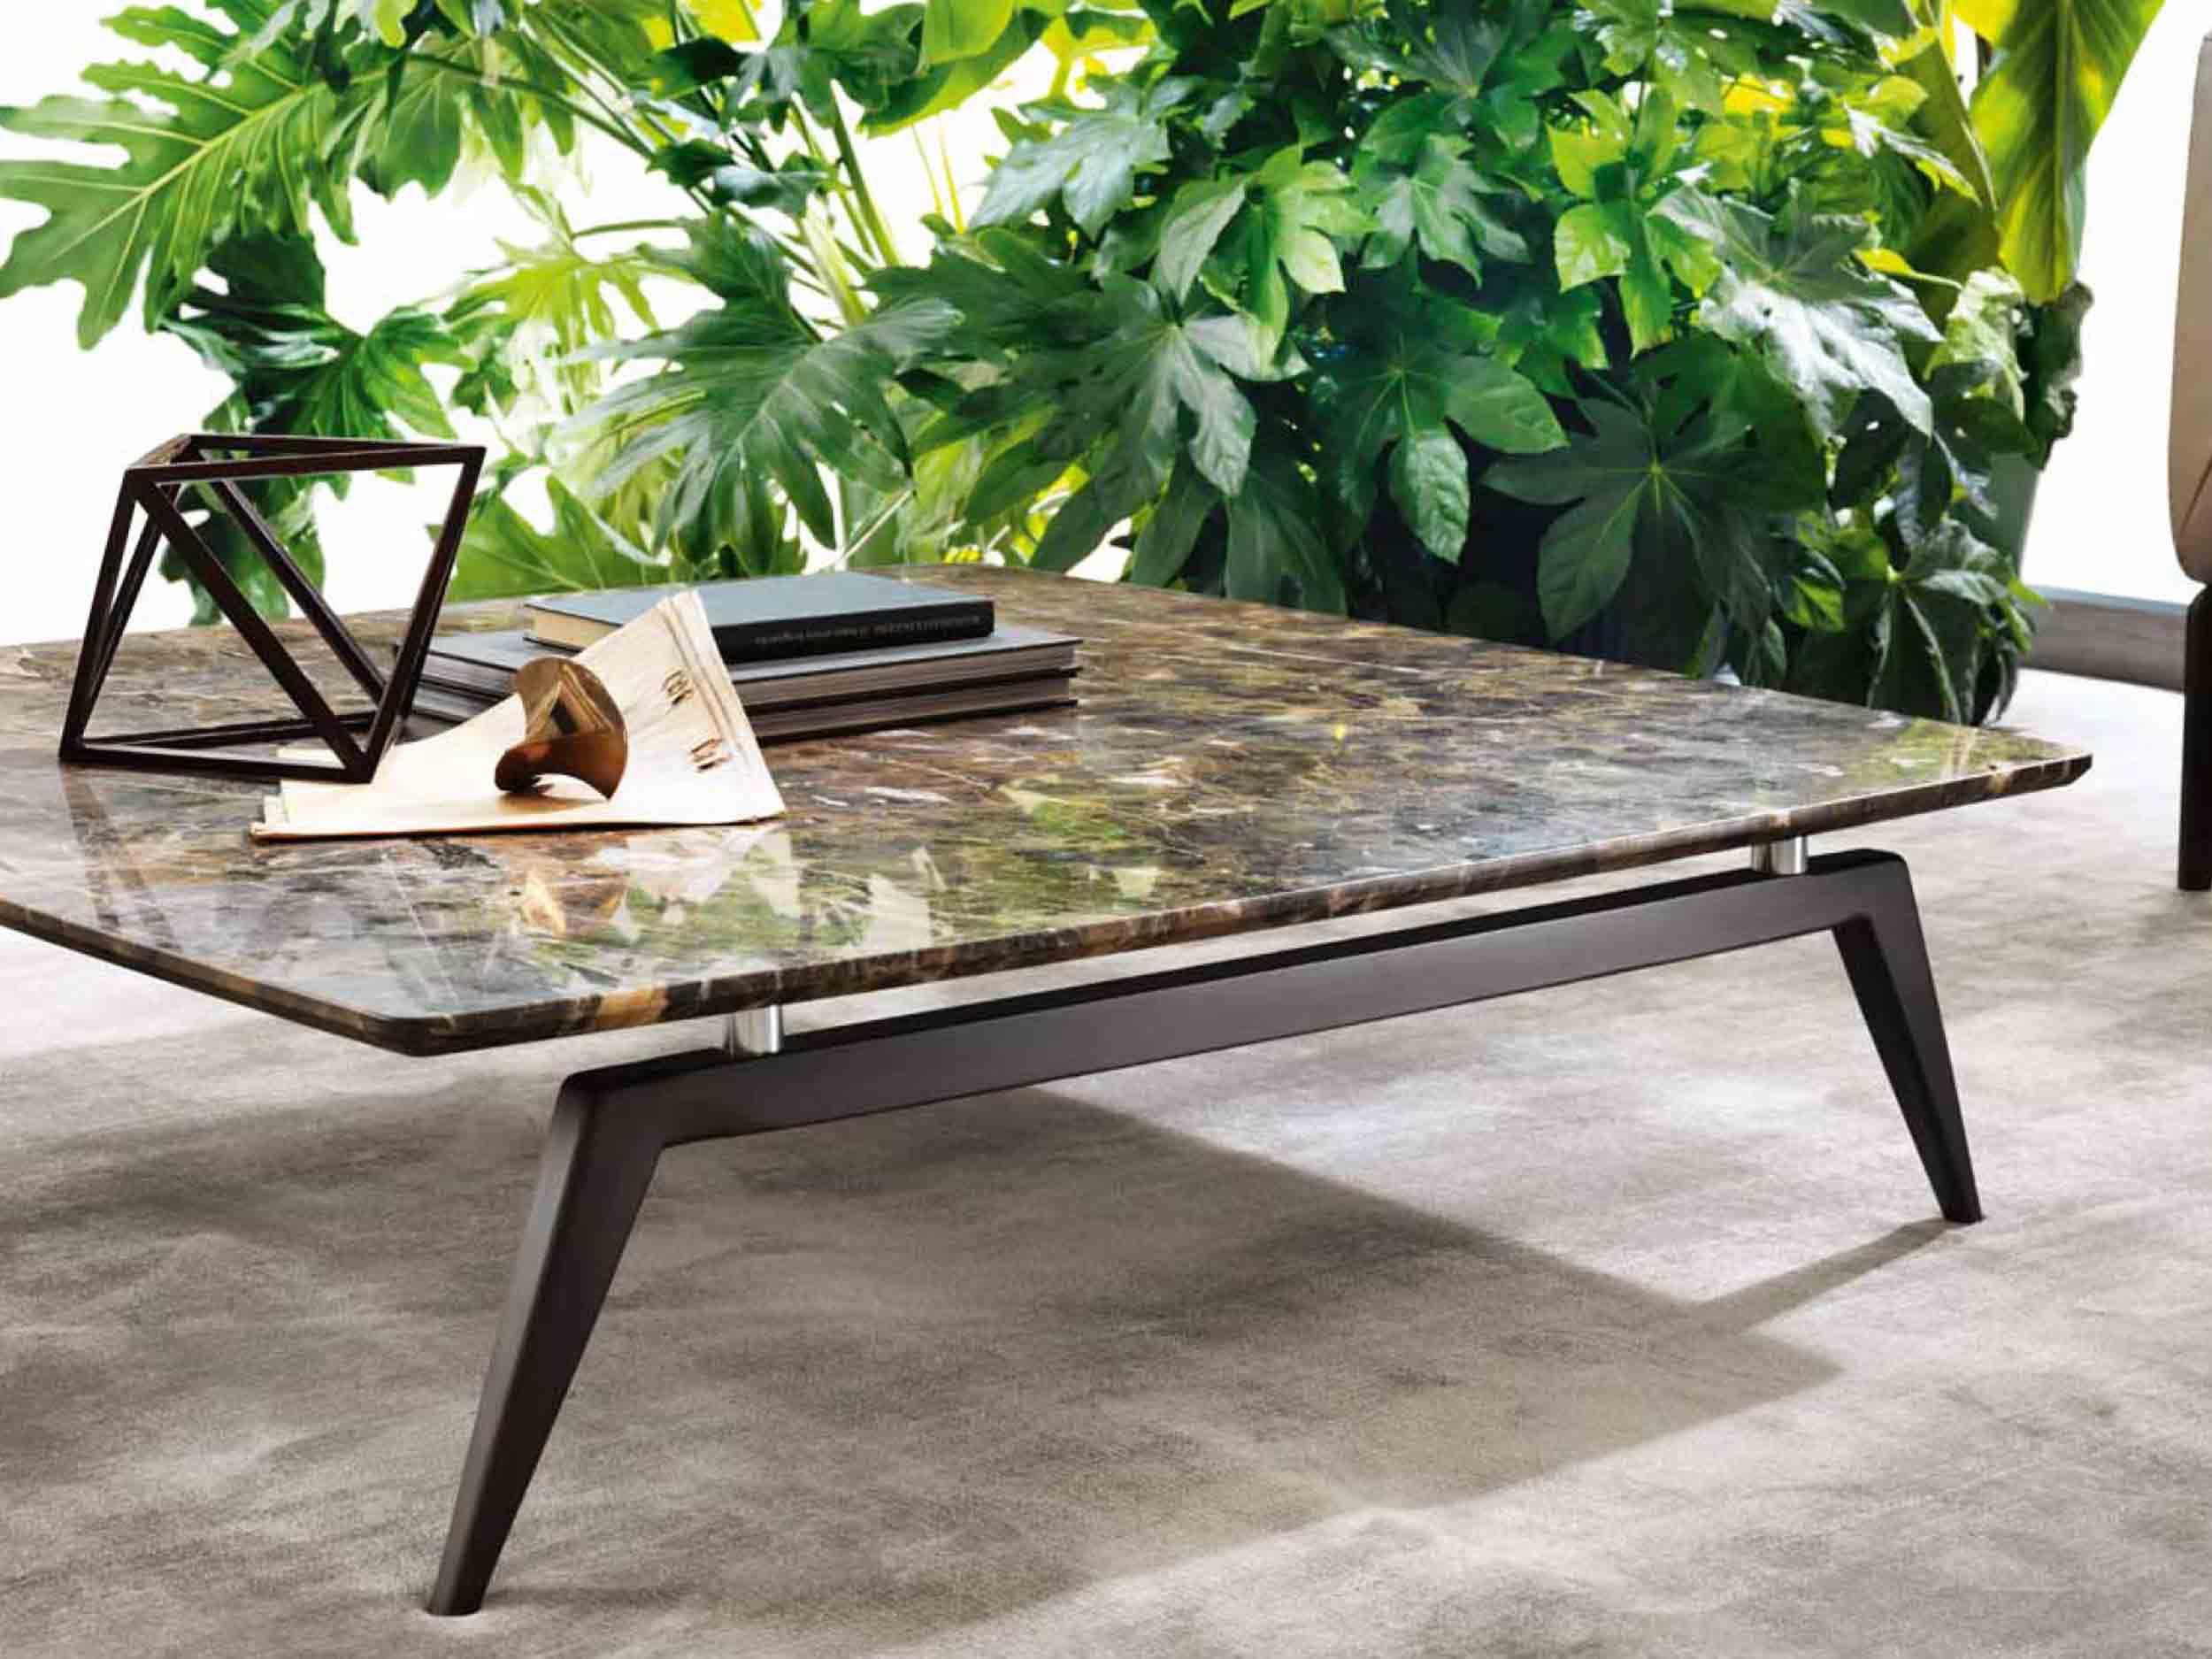 David Central Table